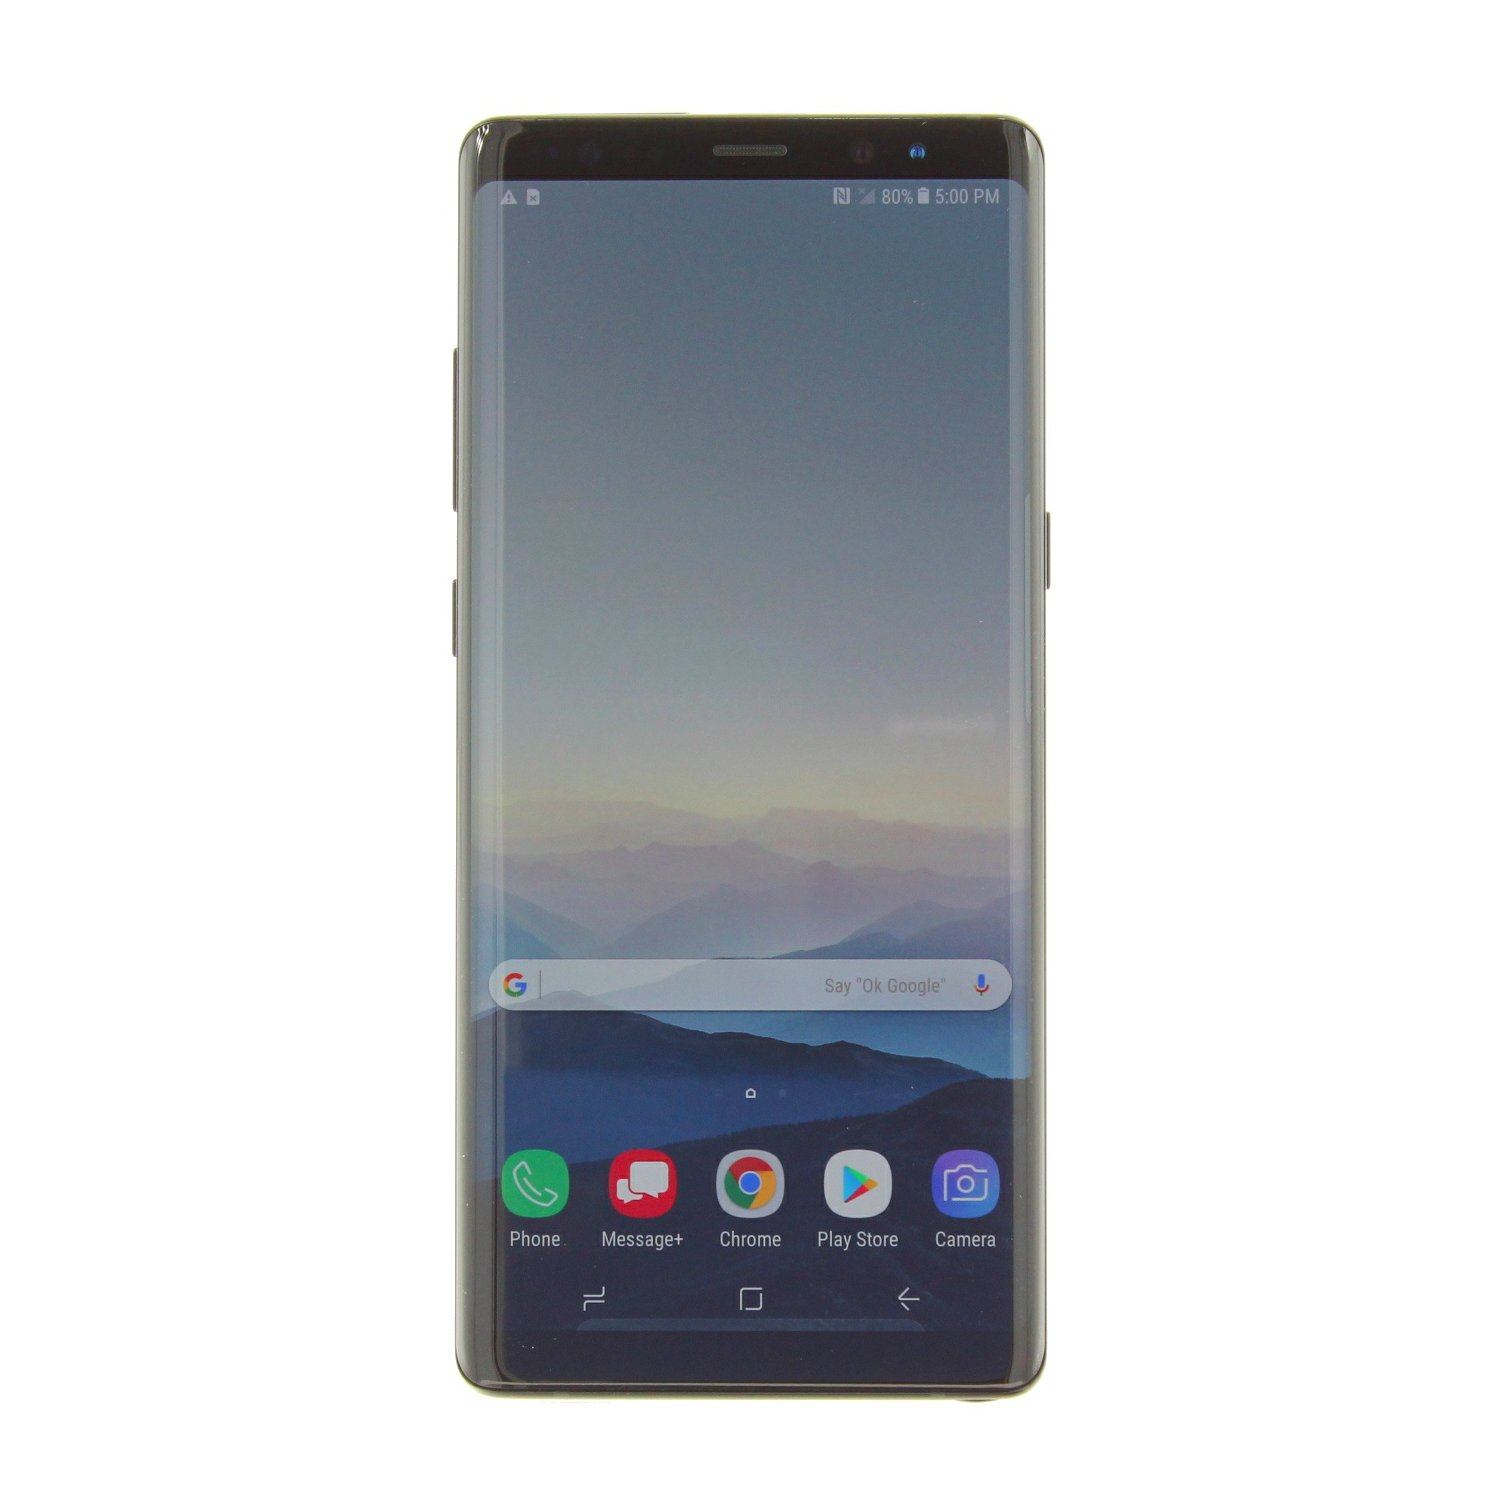 Samsung Galaxy Note 8 SM-N950U 64GB for T-Mobile (Renewed)